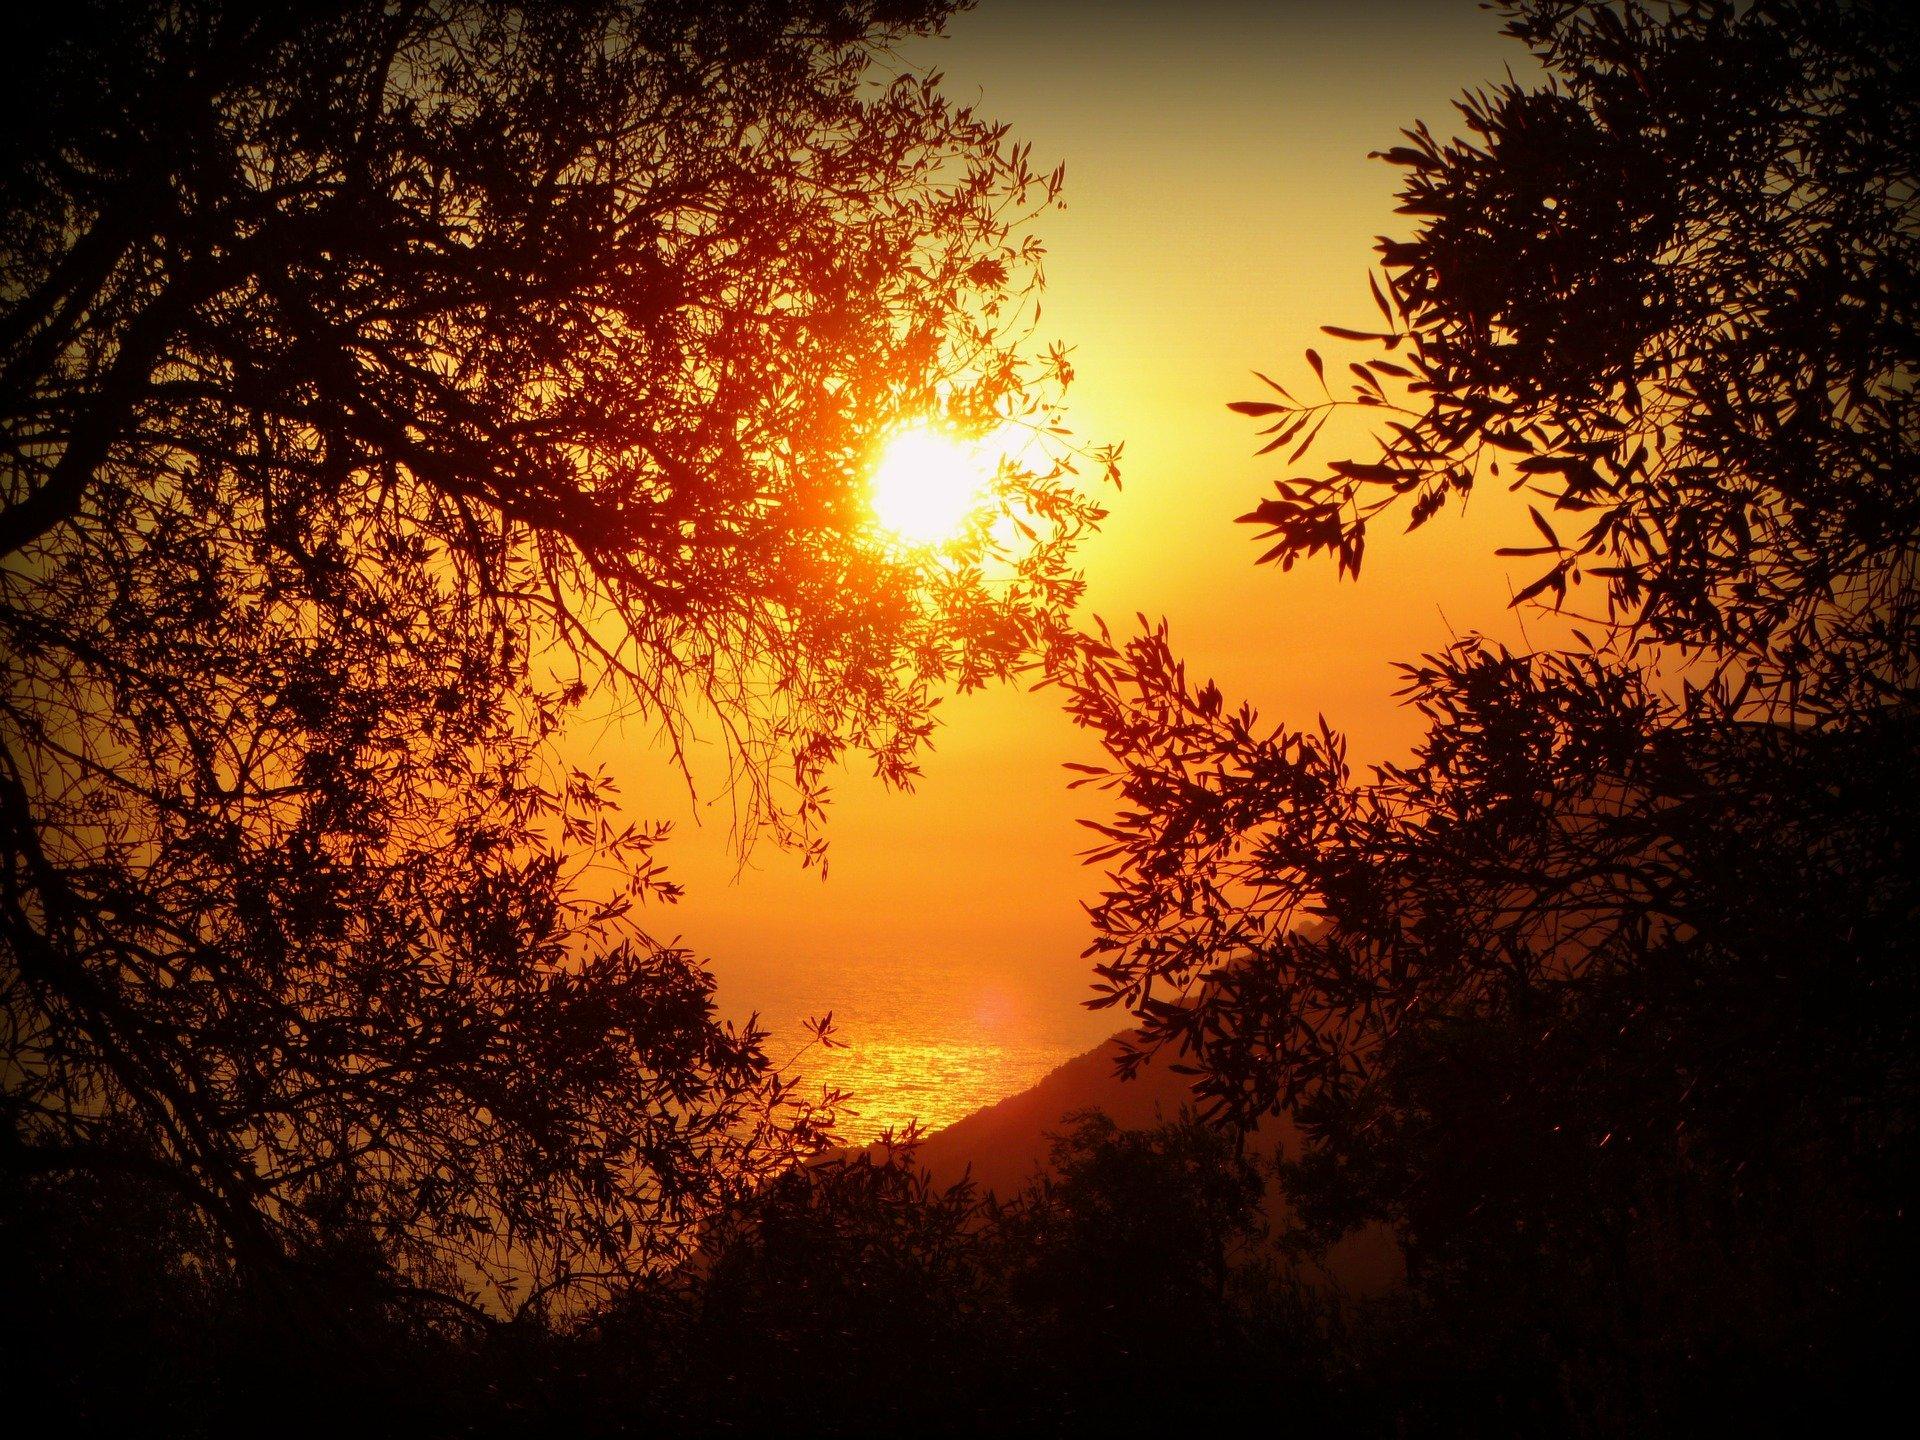 sunset-115448_1920